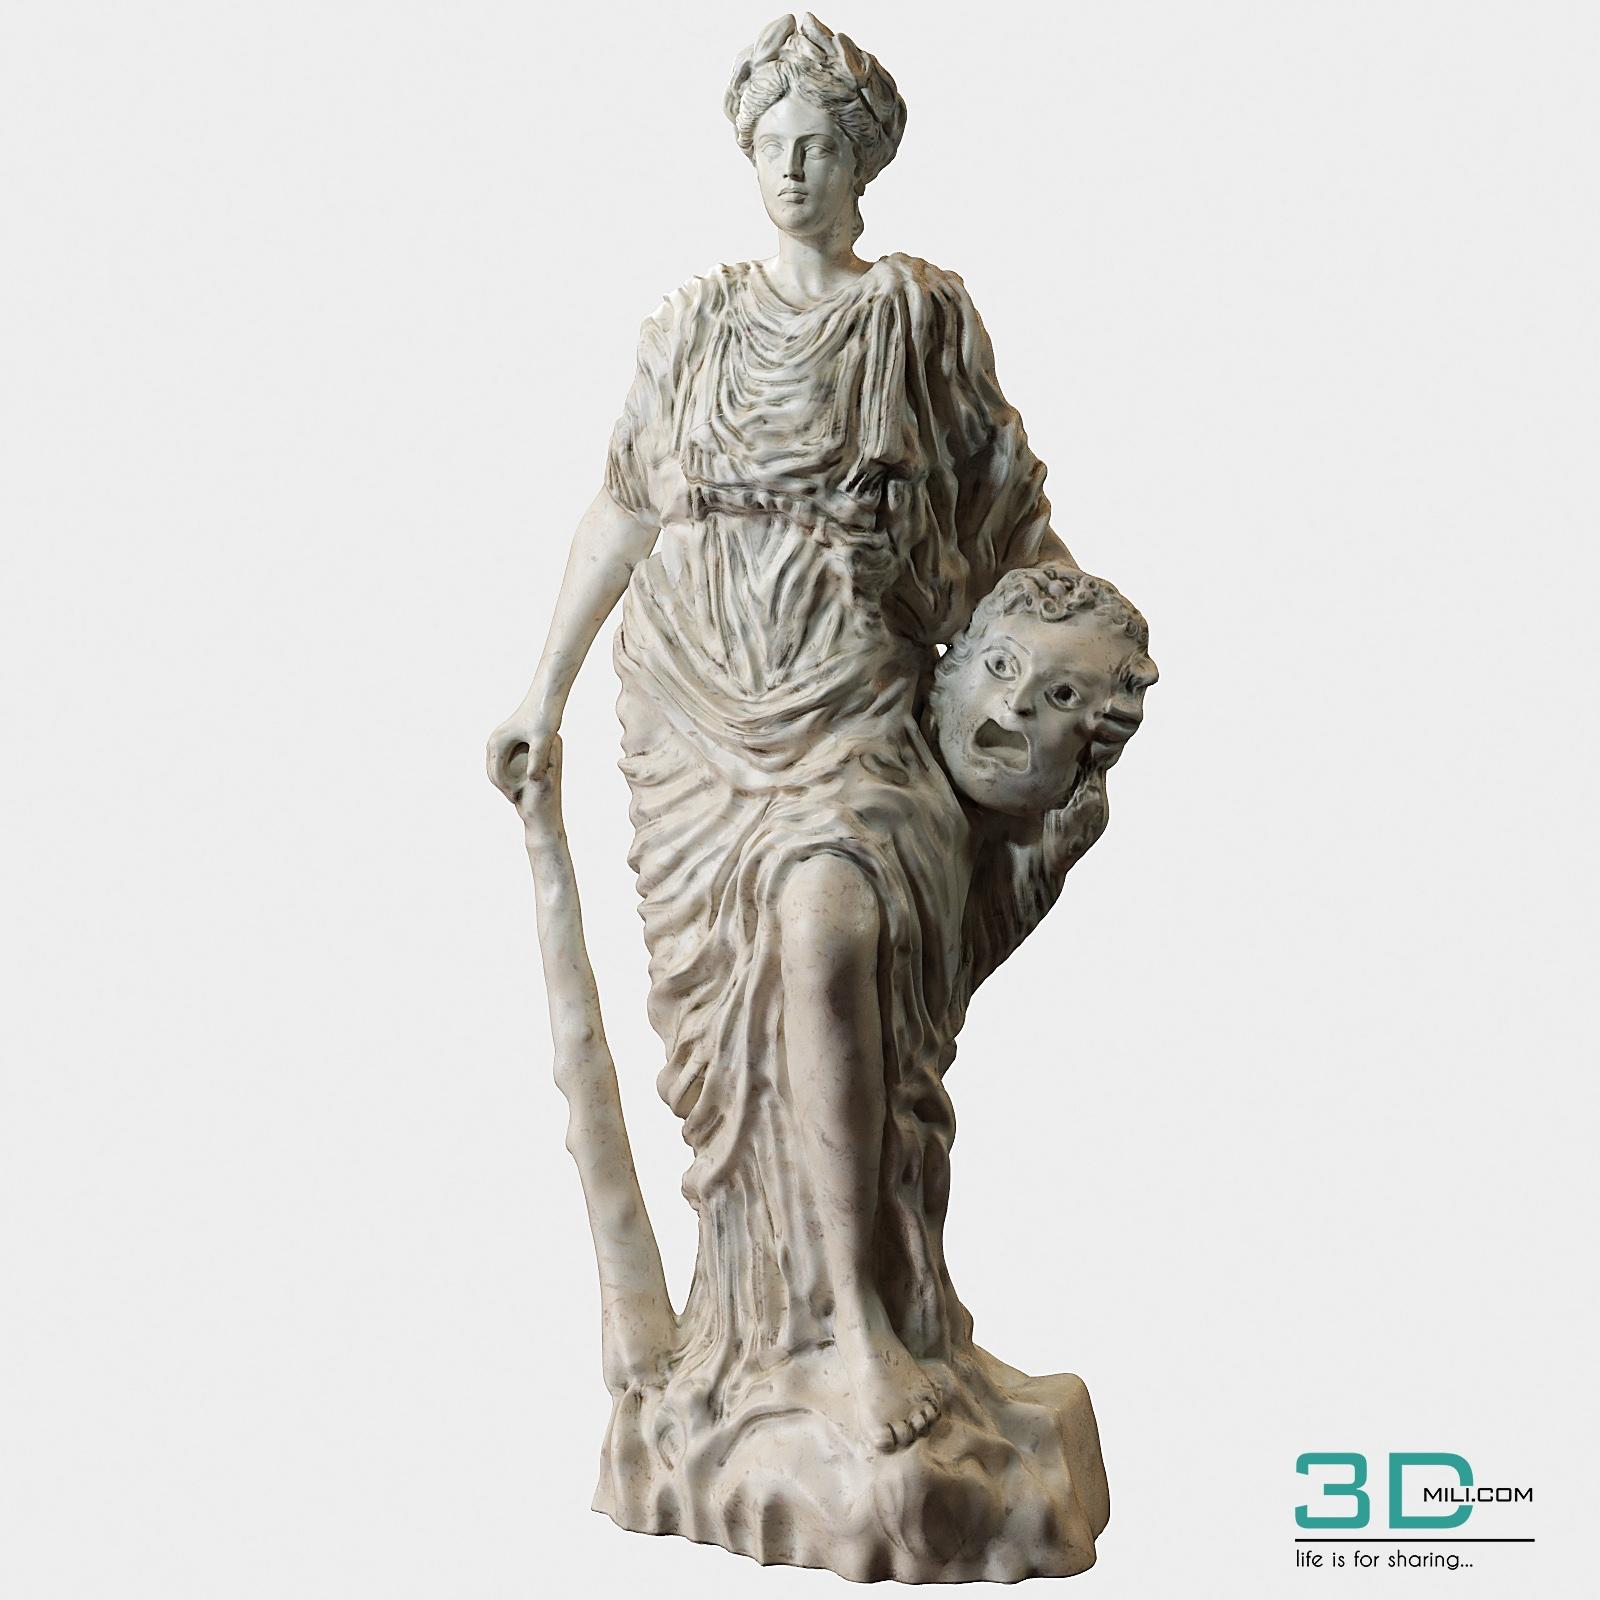 91  Sculpture Decor 3dsmax File Free Download - 3D Mili